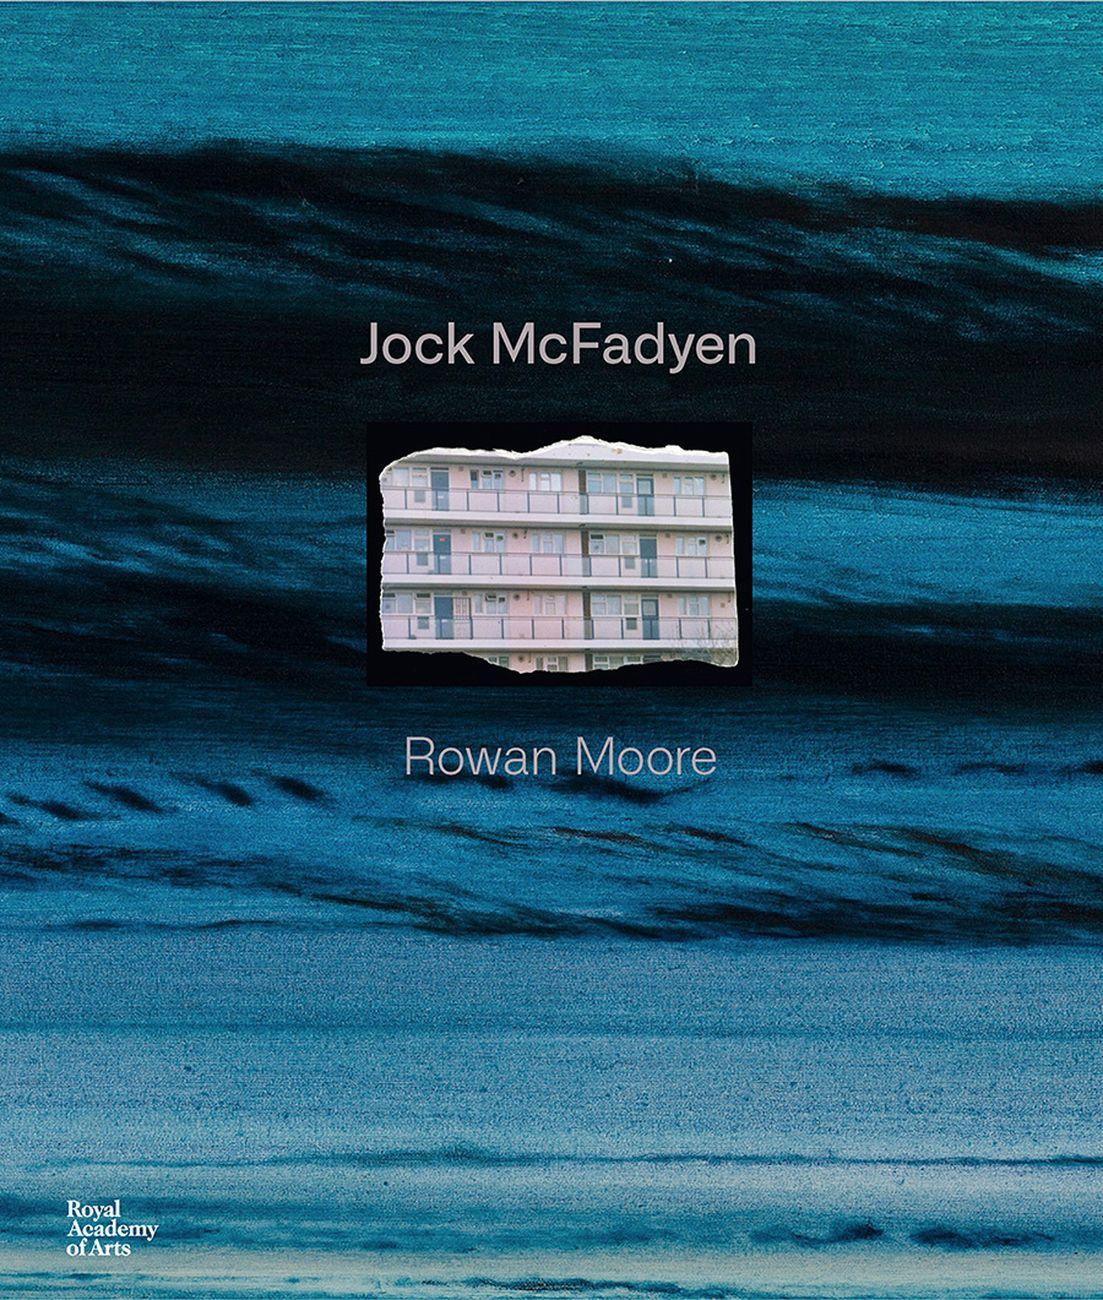 Rowan Moore, Jock McFadyen, Royal Academy of Arts, London 2019. Courtesy Royal Academy of Arts